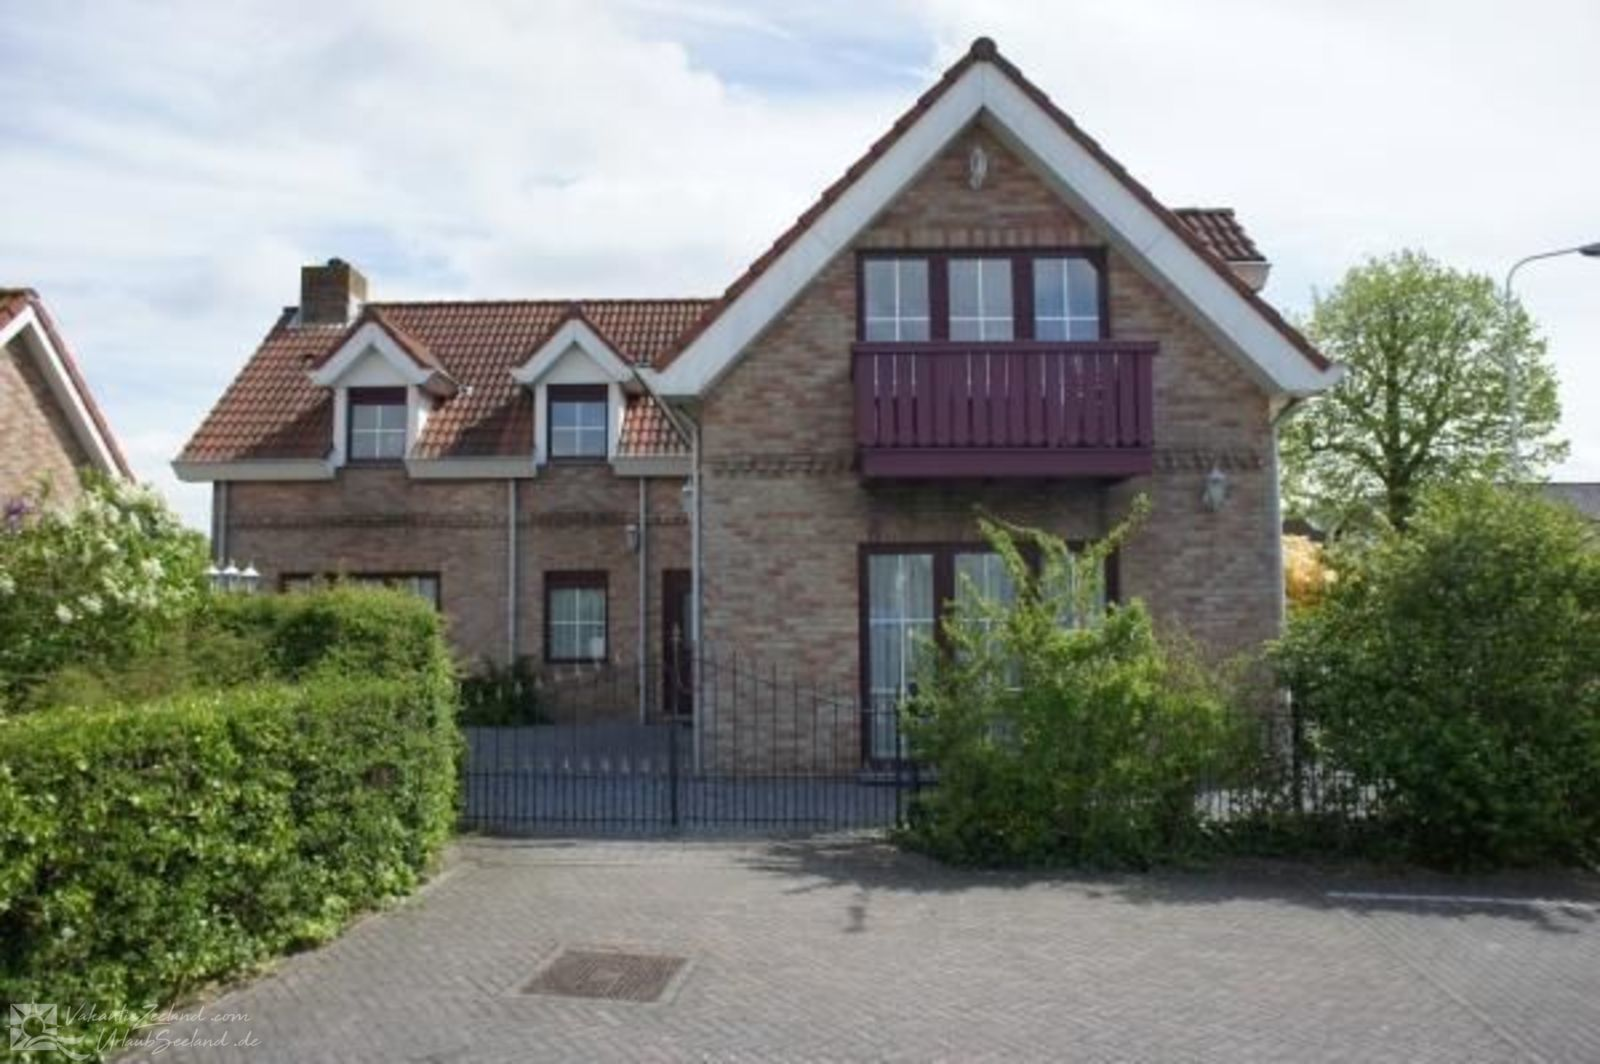 VZ024 Atelierwohnung in Groede